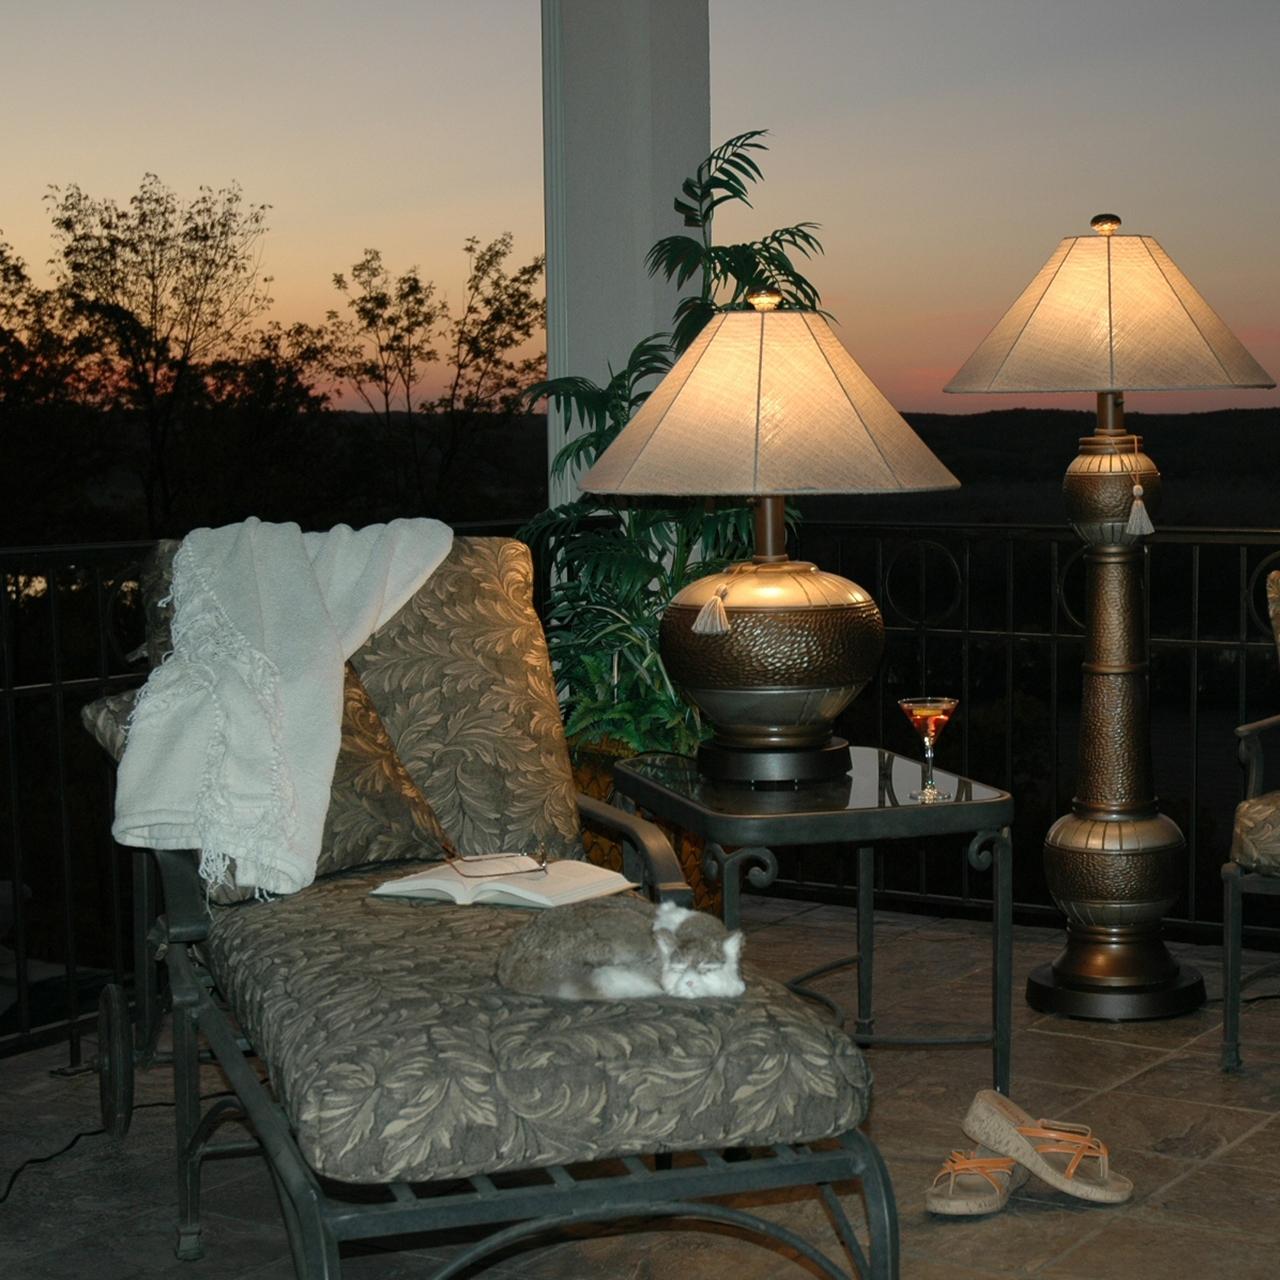 Floor Lamp Product Photo